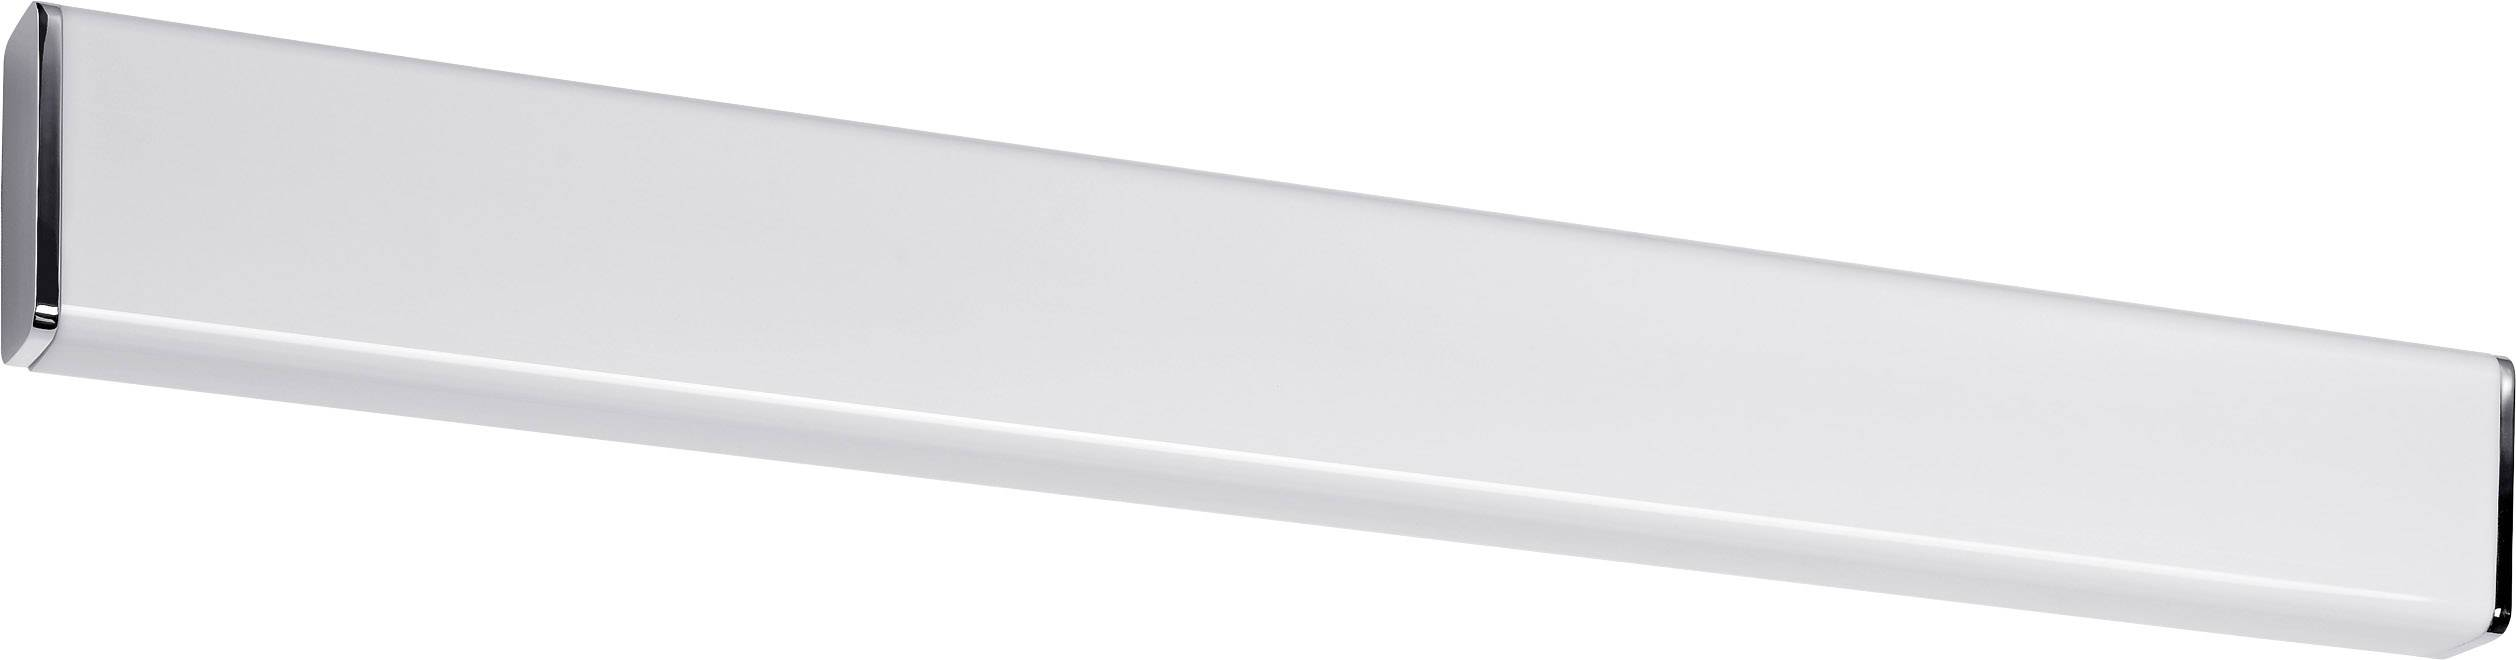 Badkamer Wandlamp Chroom : Wandlamp badkamer spiegel philips hue eglo palmera wandlamp mat